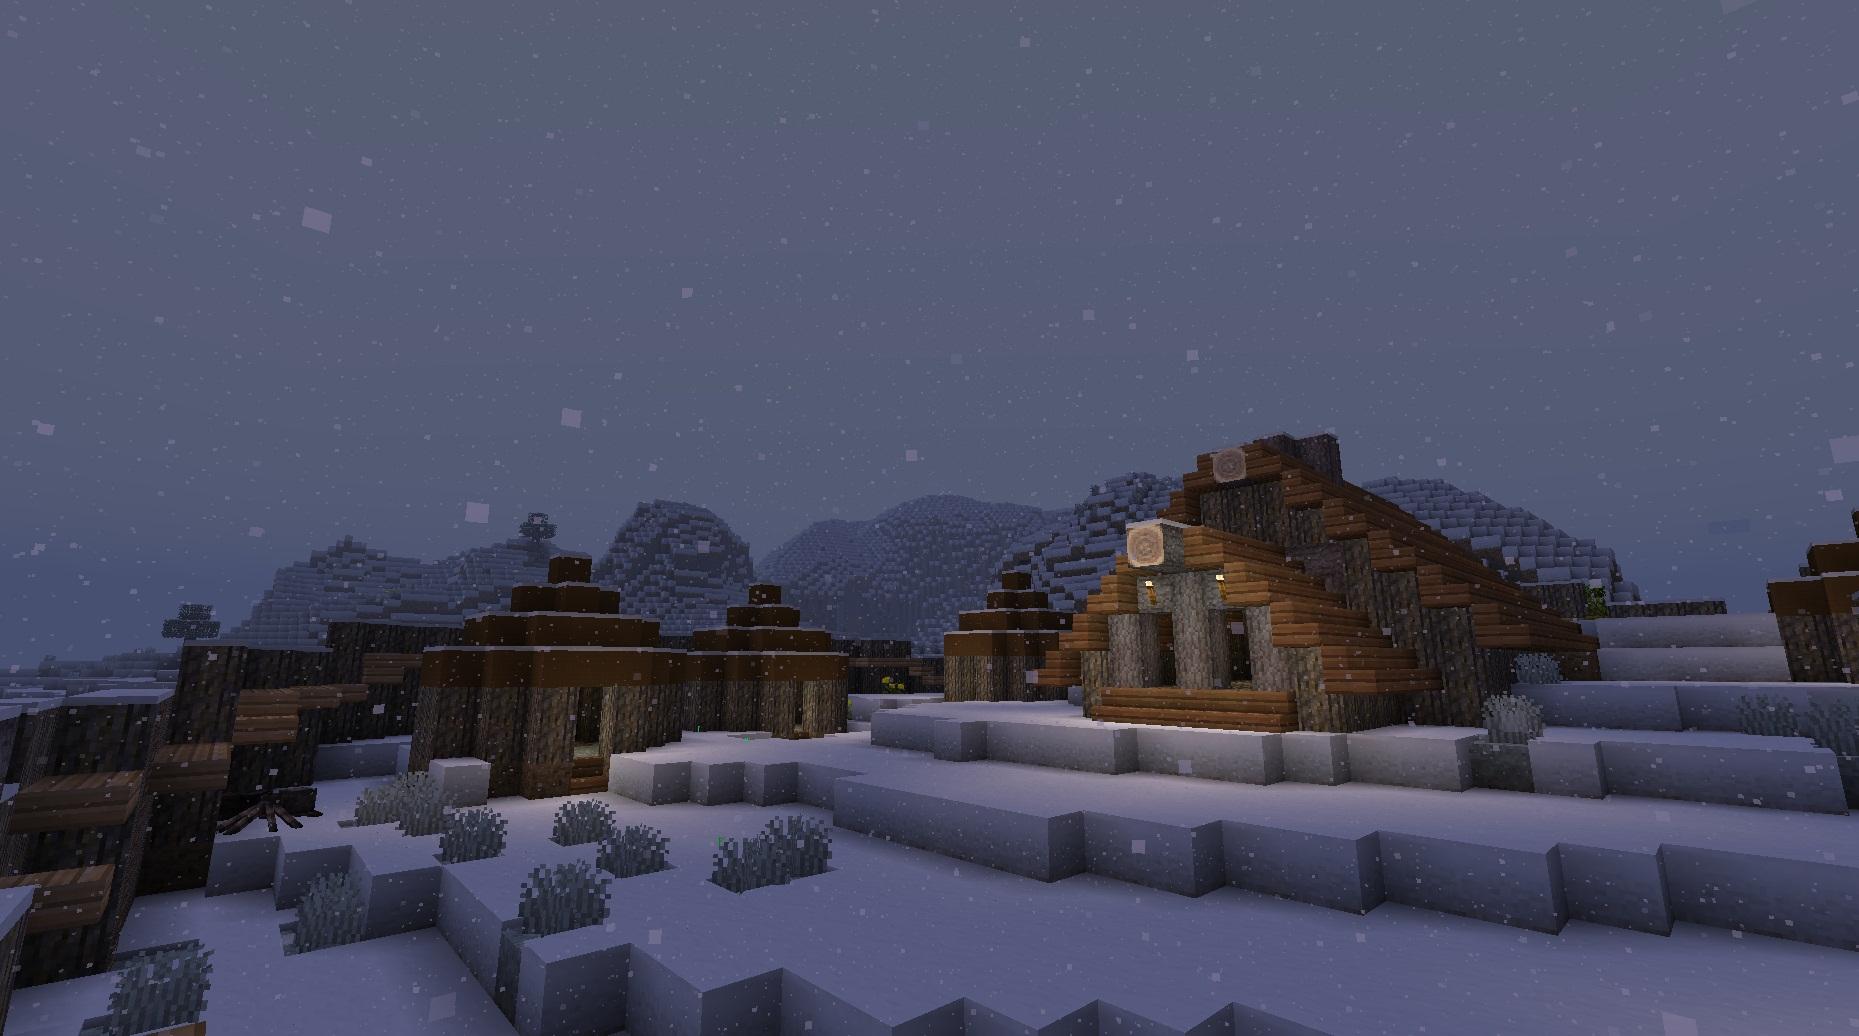 http://minecraft-forum.net/wp-content/uploads/2012/12/210dd__Pixel-Reality-Texture-Pack-3.jpg